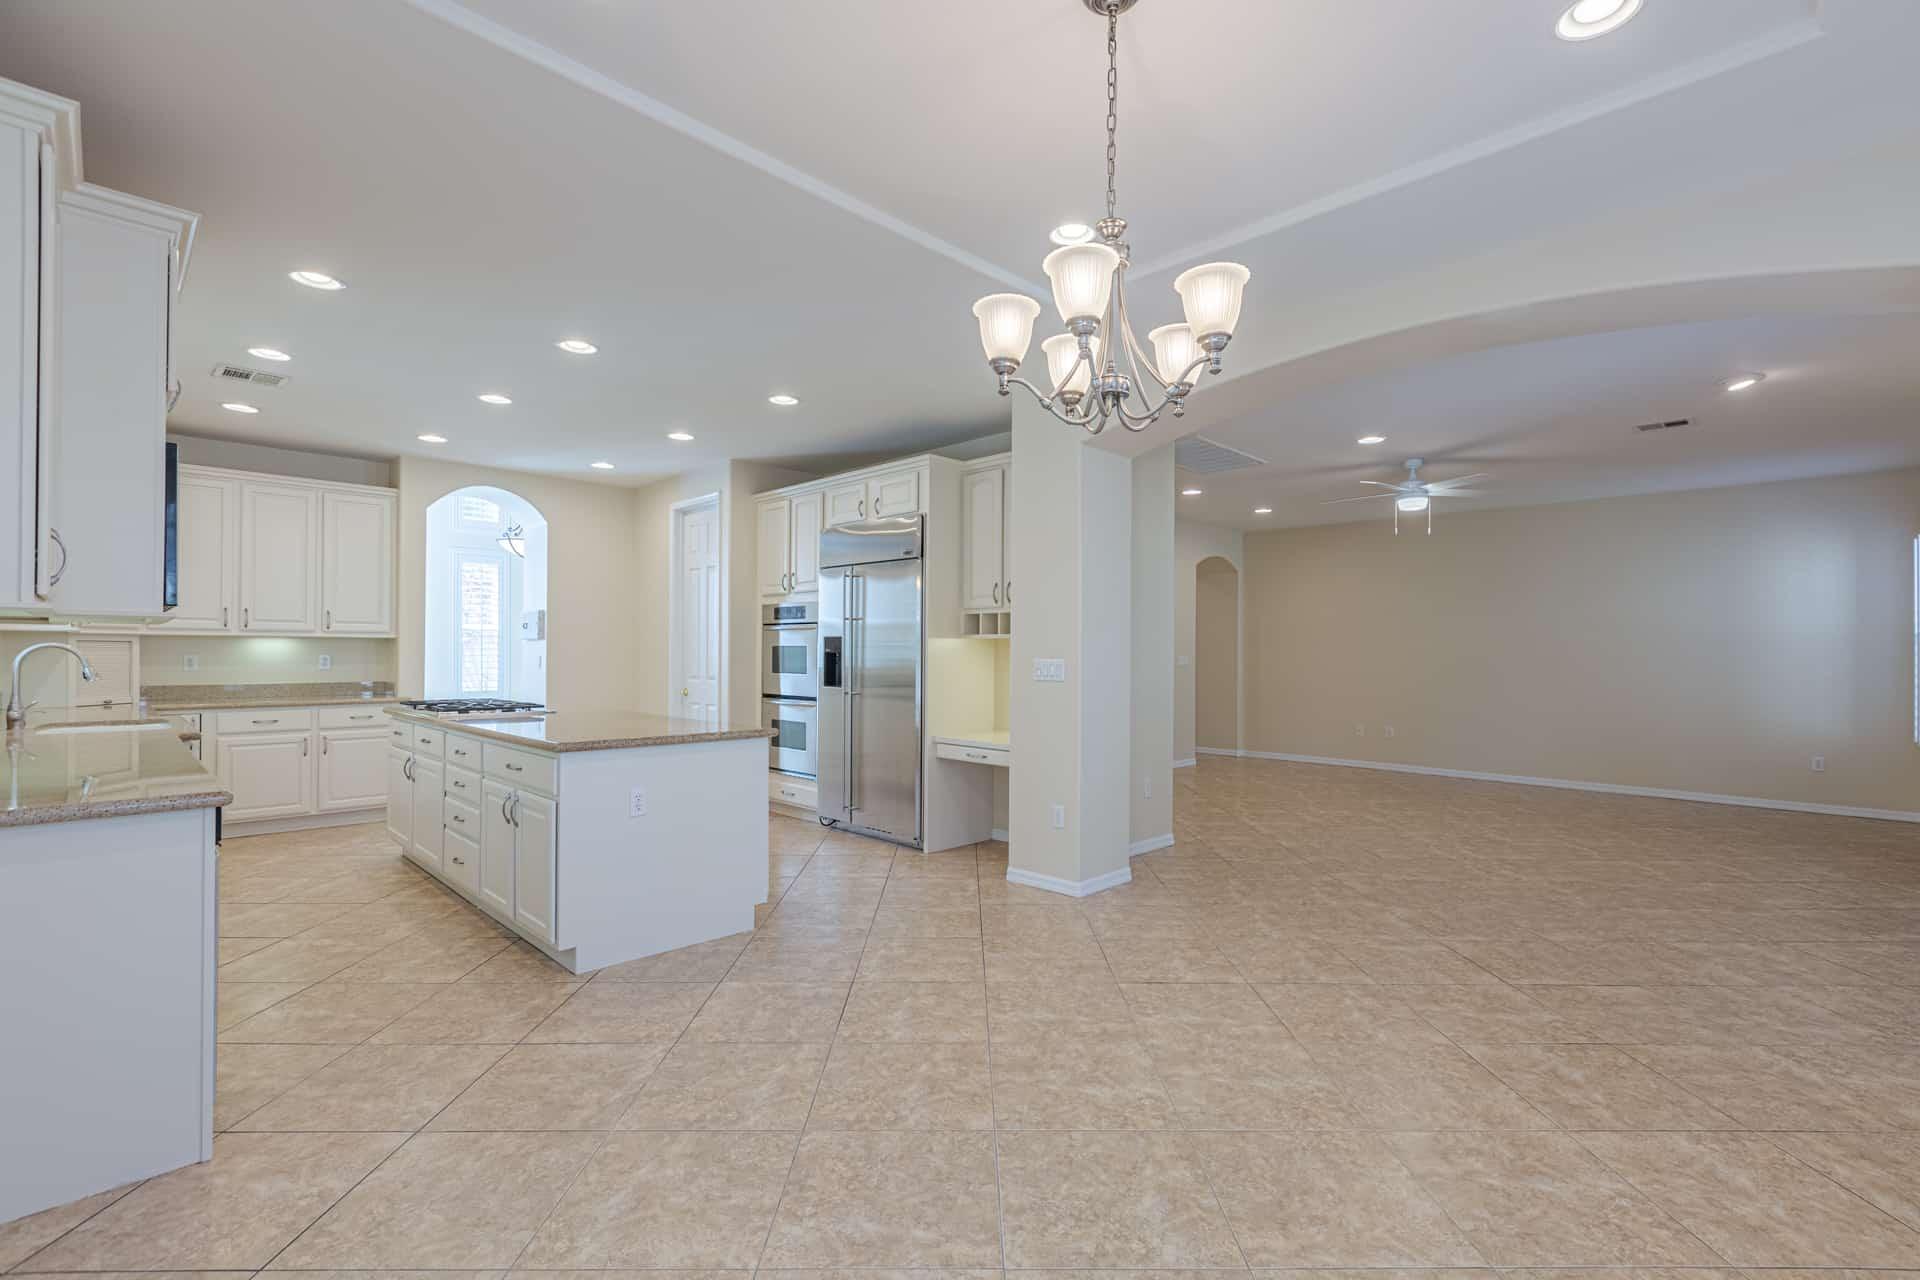 las-vegas-luxry-real-estate-realtor-rob-jensen-company-10729-grey-havens-court-willow-creek1757